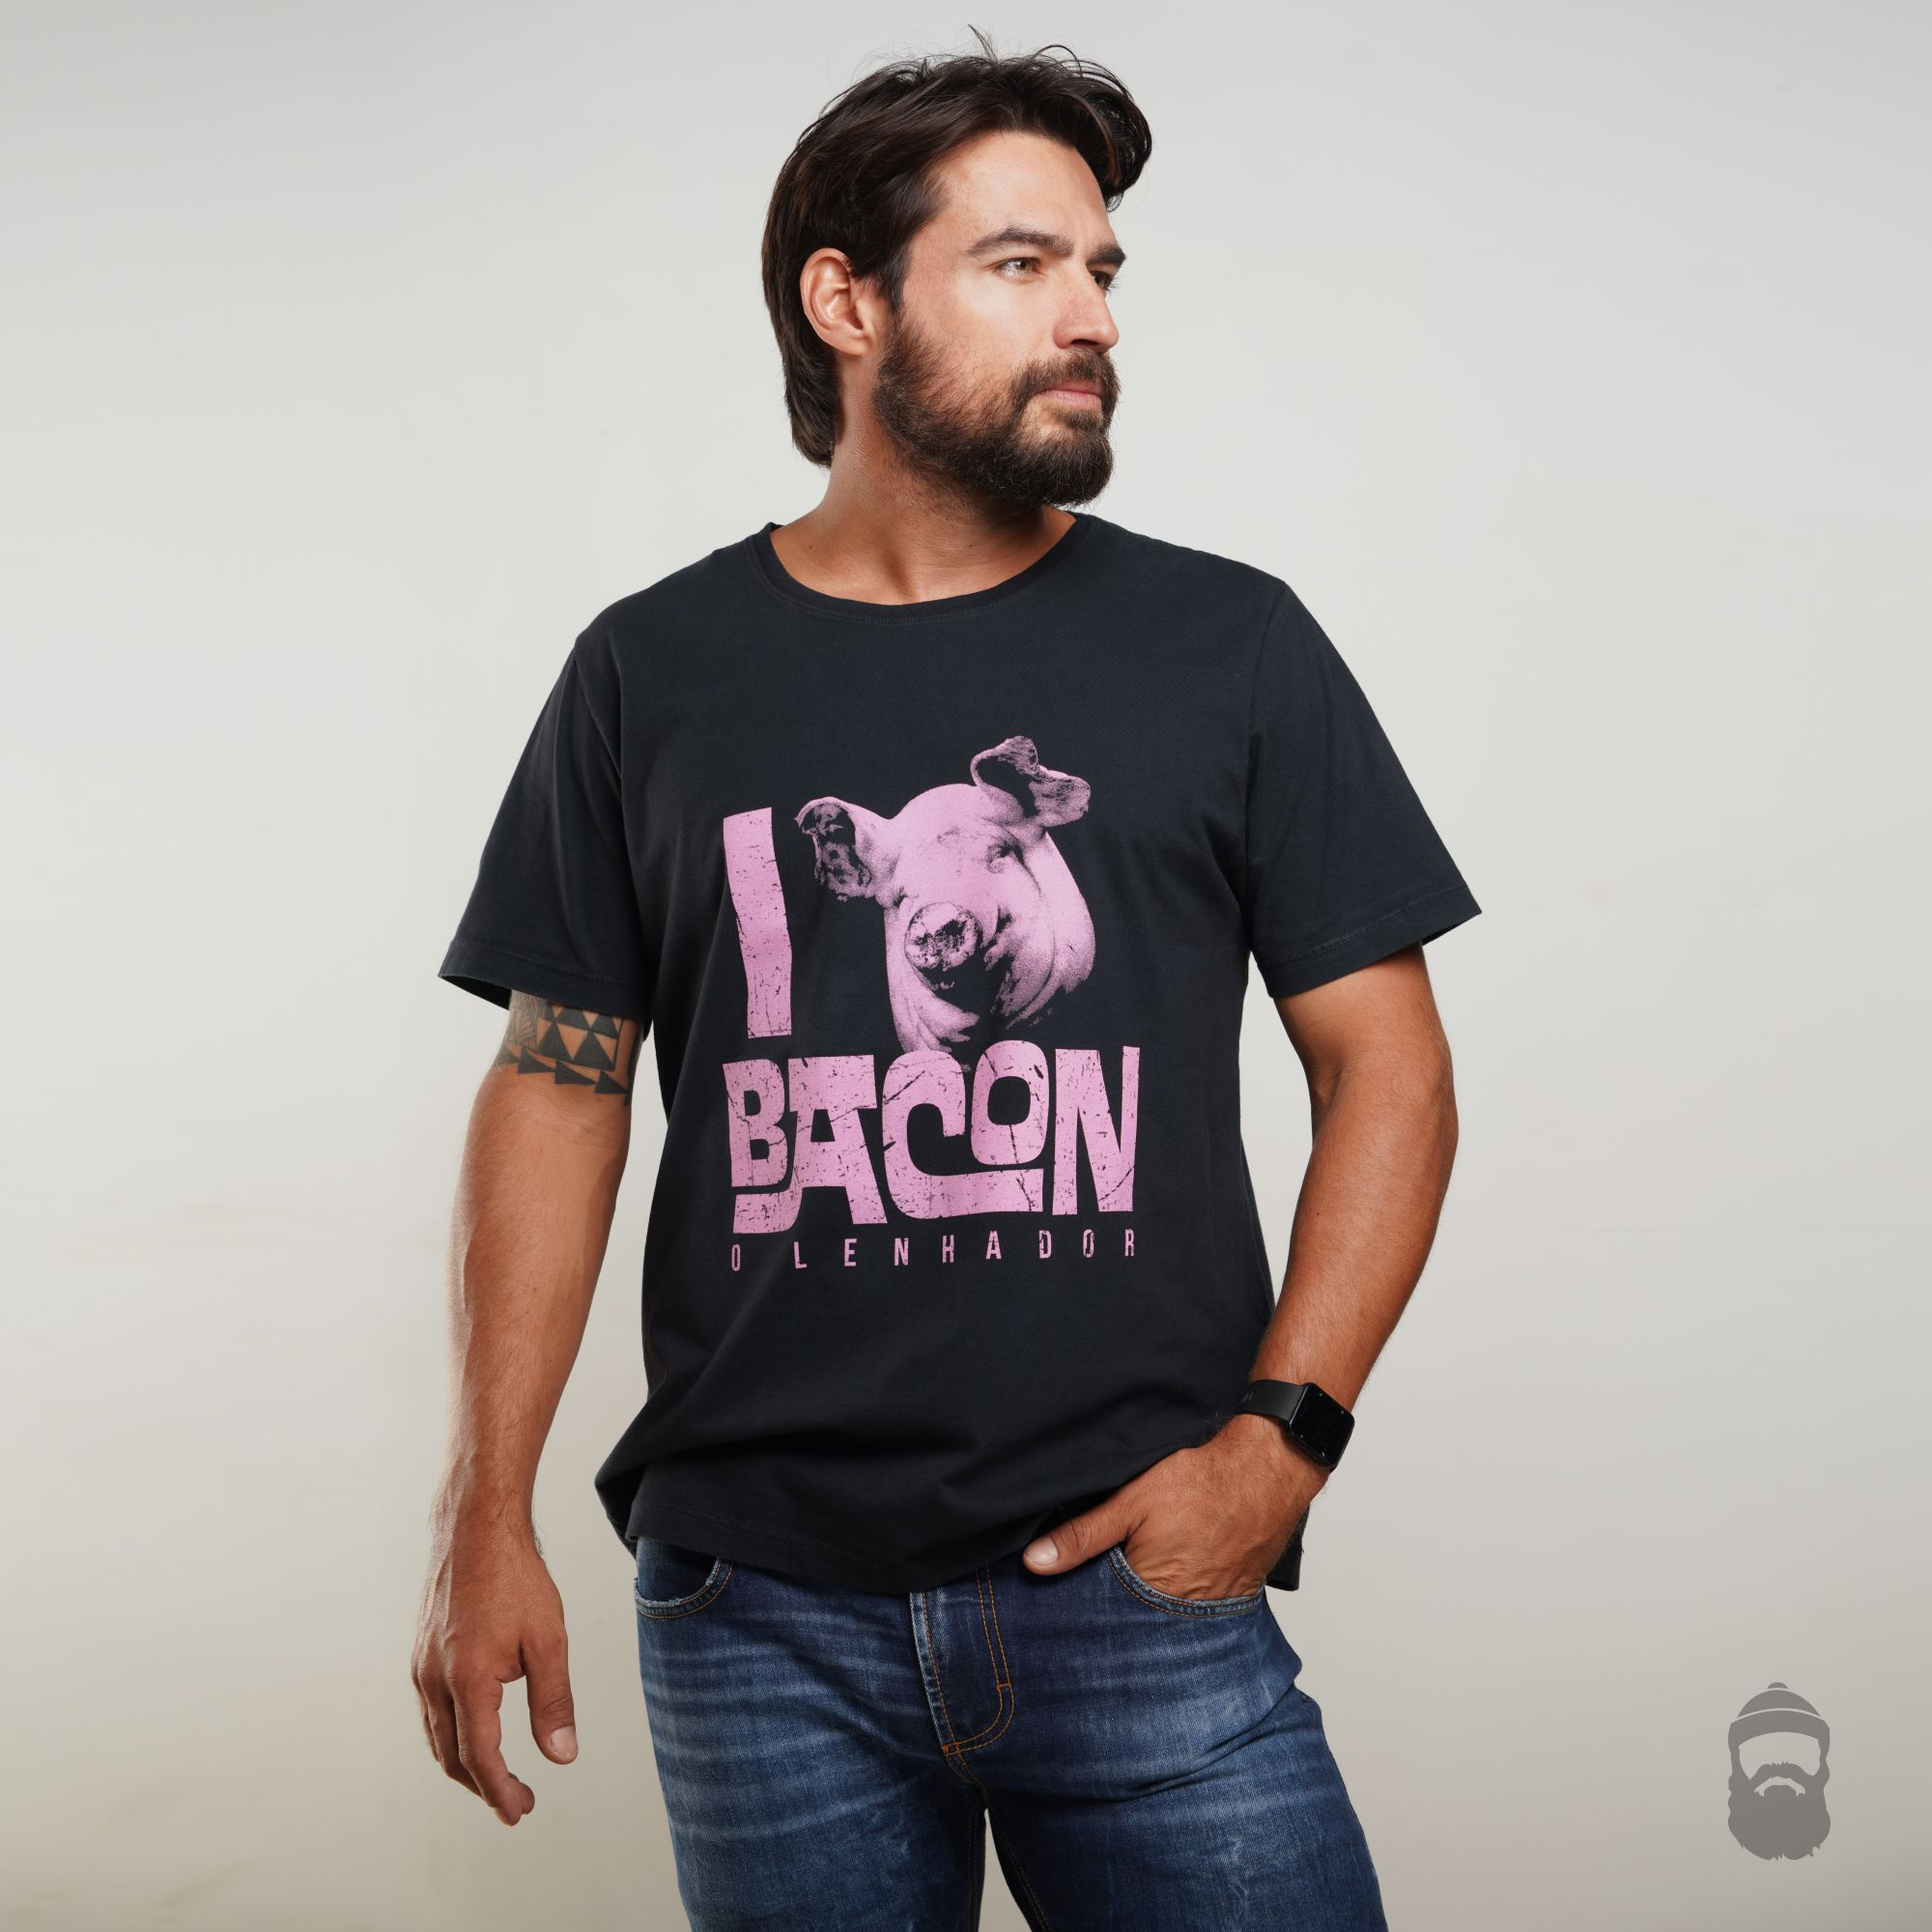 O Lenhador Camiseta Love Bacon Estonada Preta